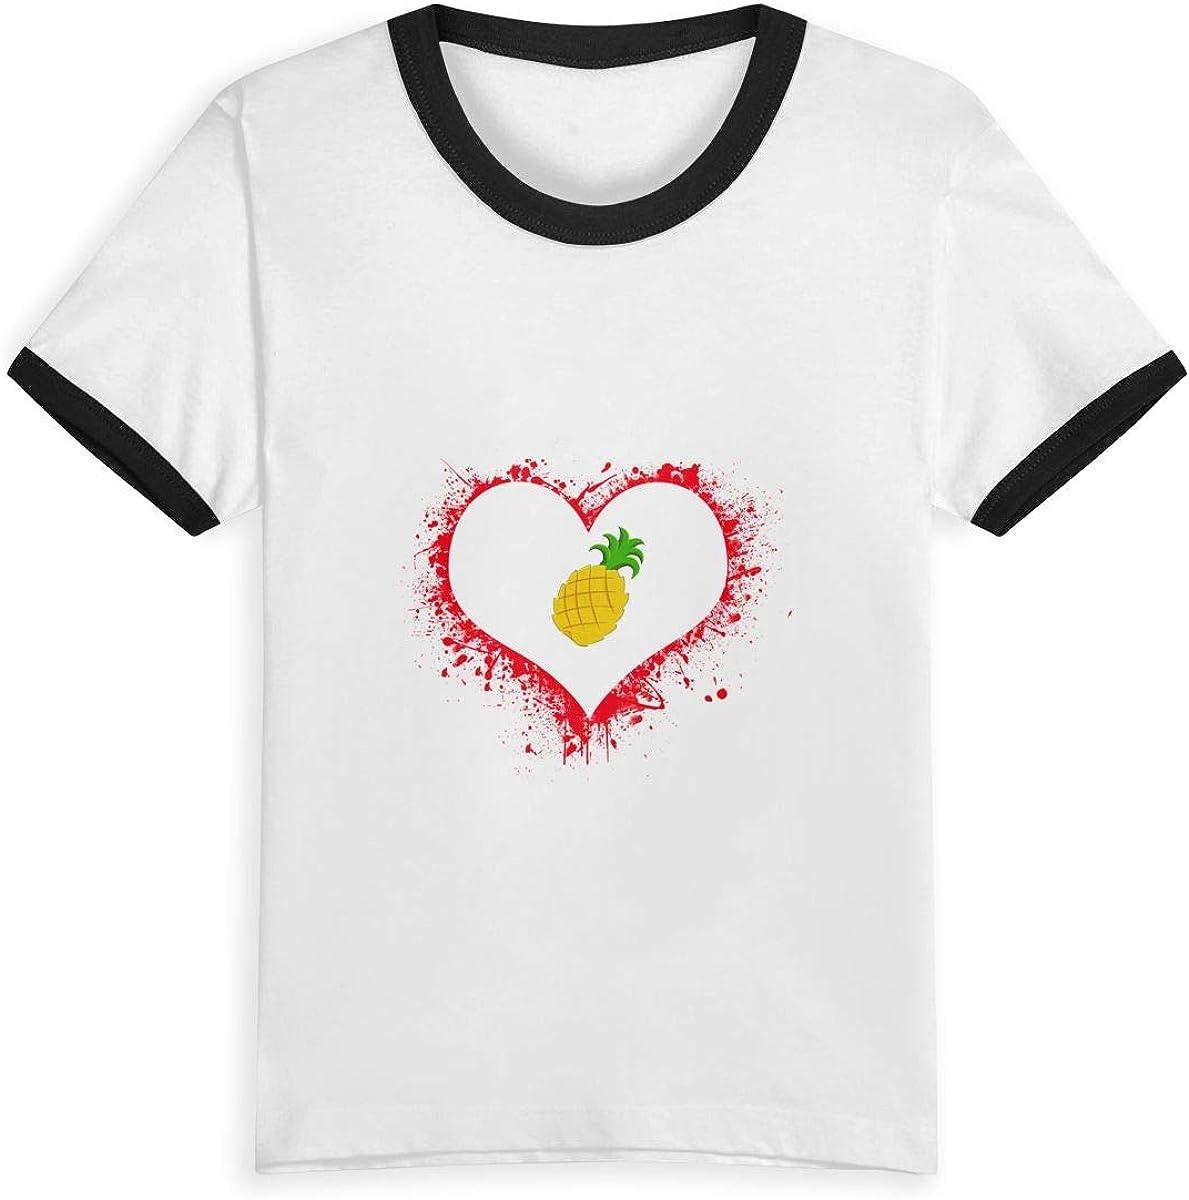 NAHSUX Design Name Childrens Short Sleeve for Children Kids Unisex Fashion Cute